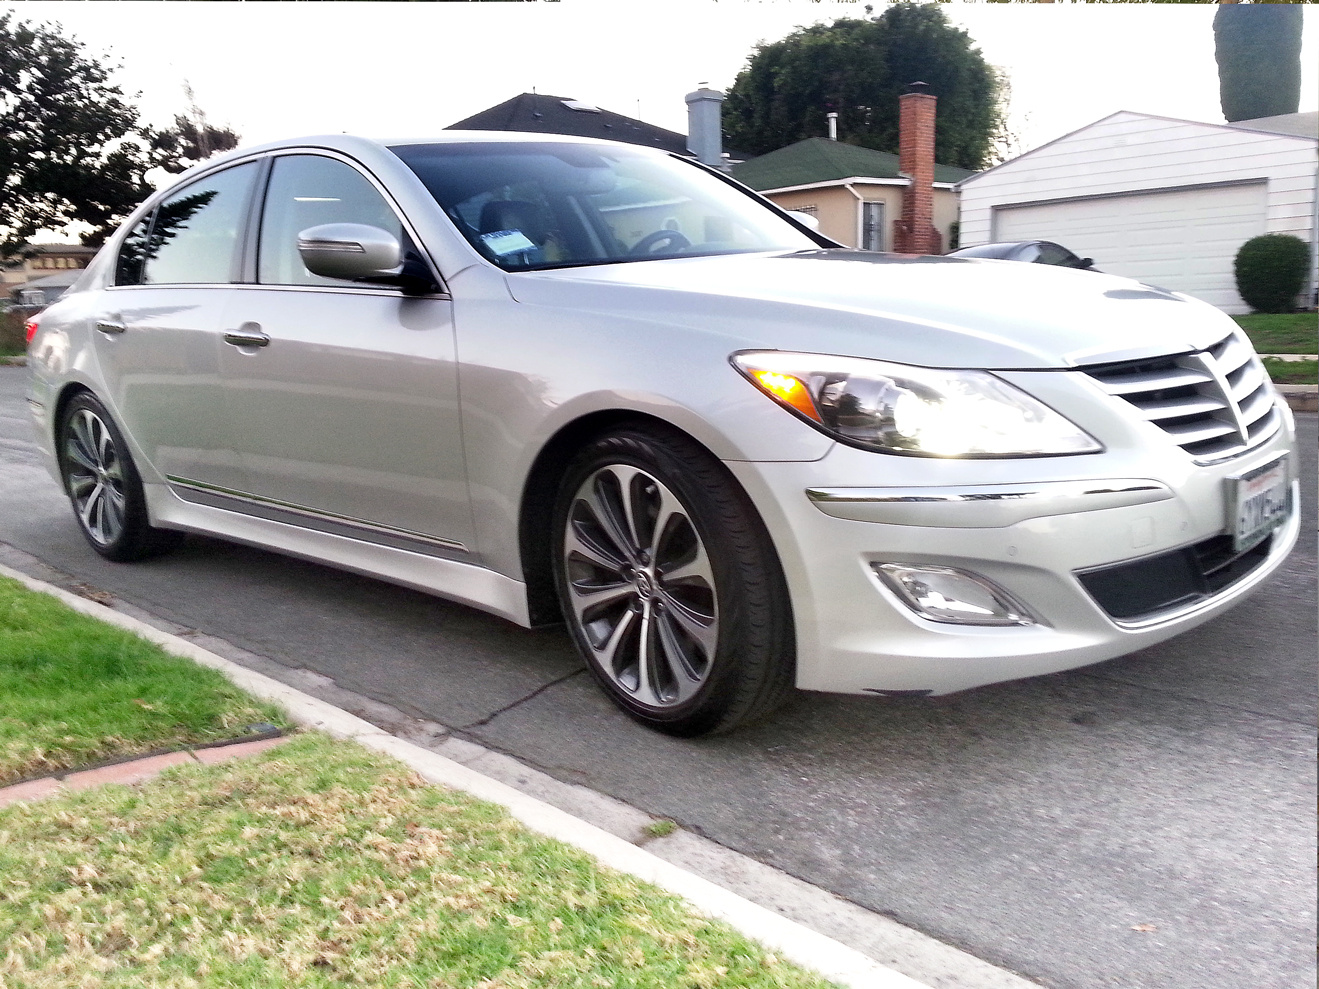 Used Cars For Sale Ventura Ca Upcomingcarshq Com